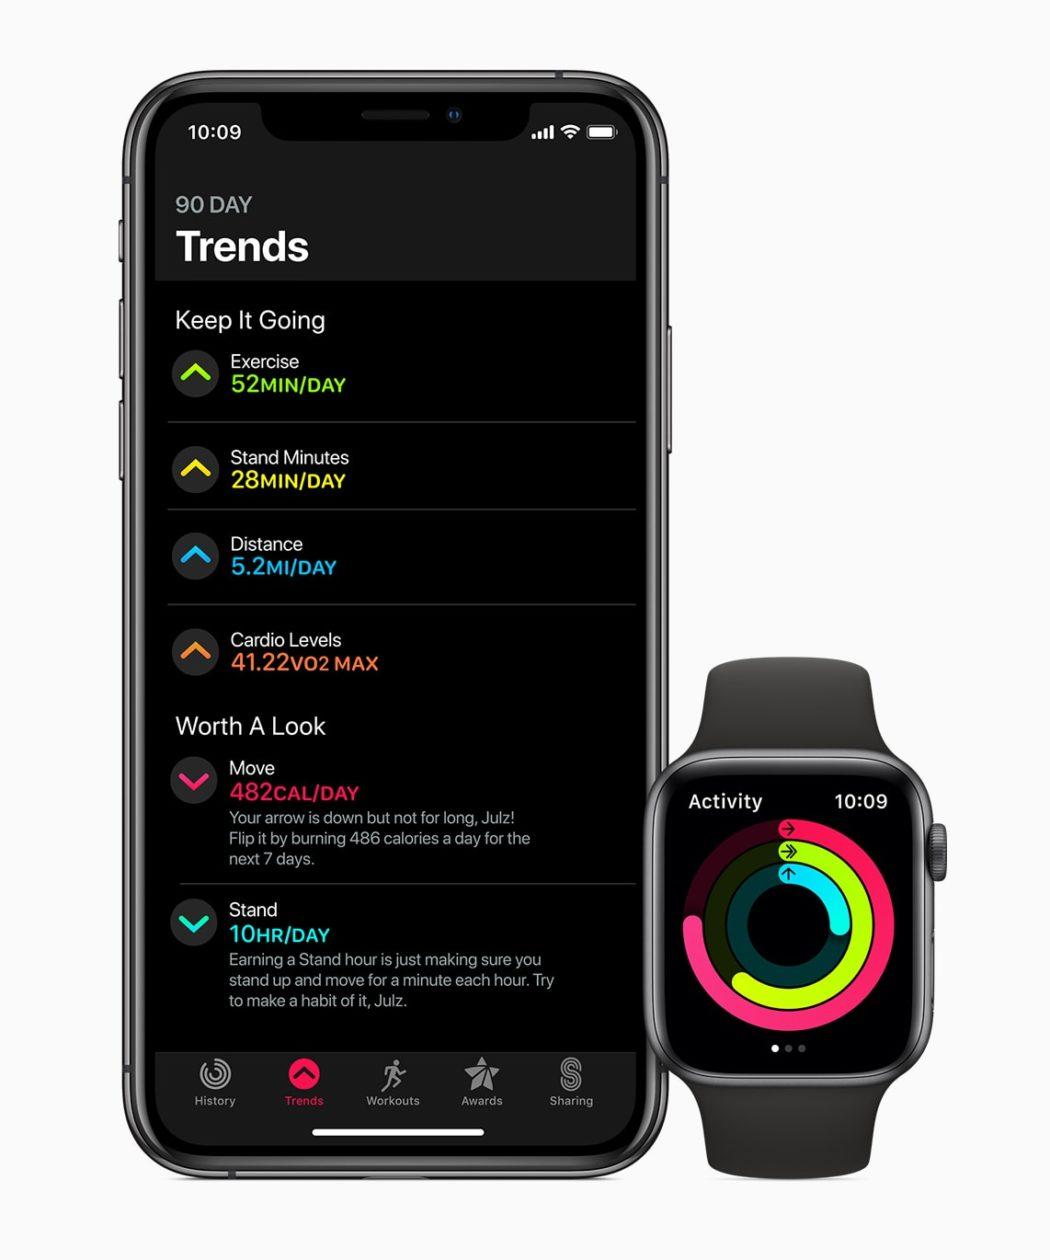 WatchOS 6 and iOS 13 App Activity Trends